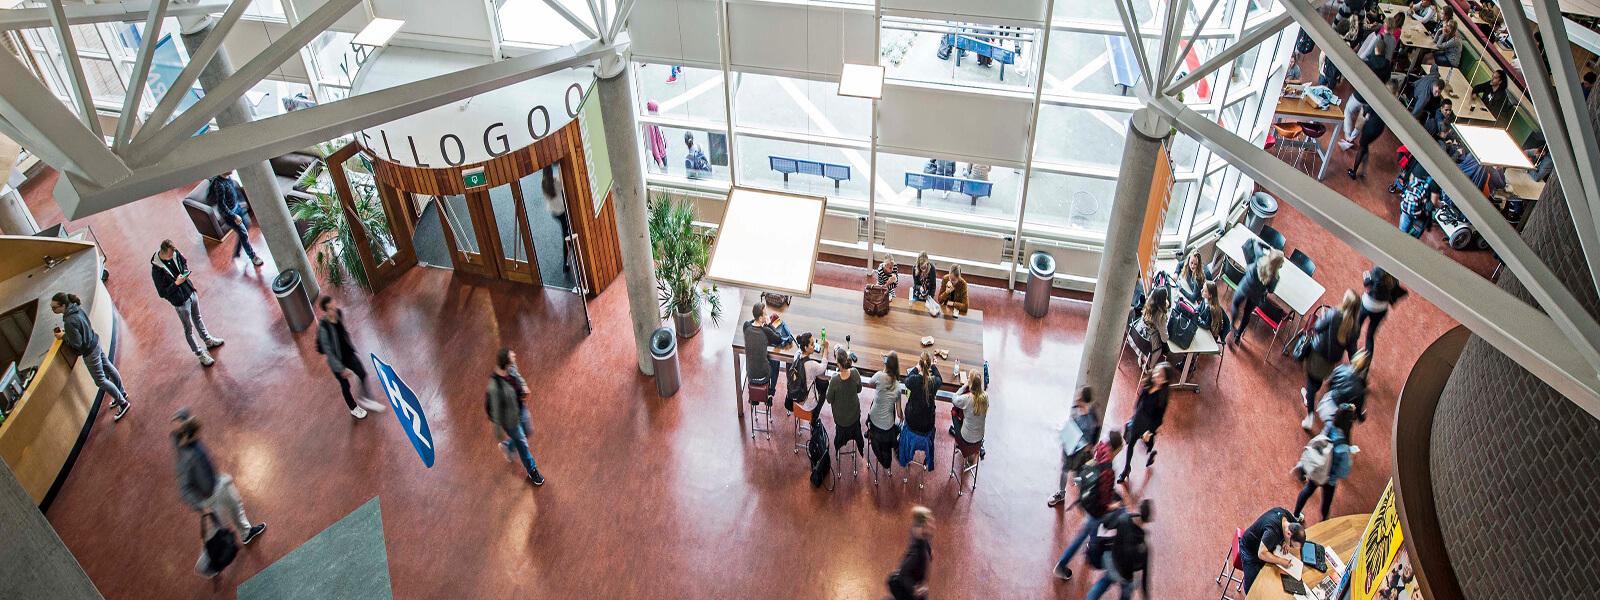 universitiesofappliedsciences-hz zeeland-vlissingen-middelburg-holland